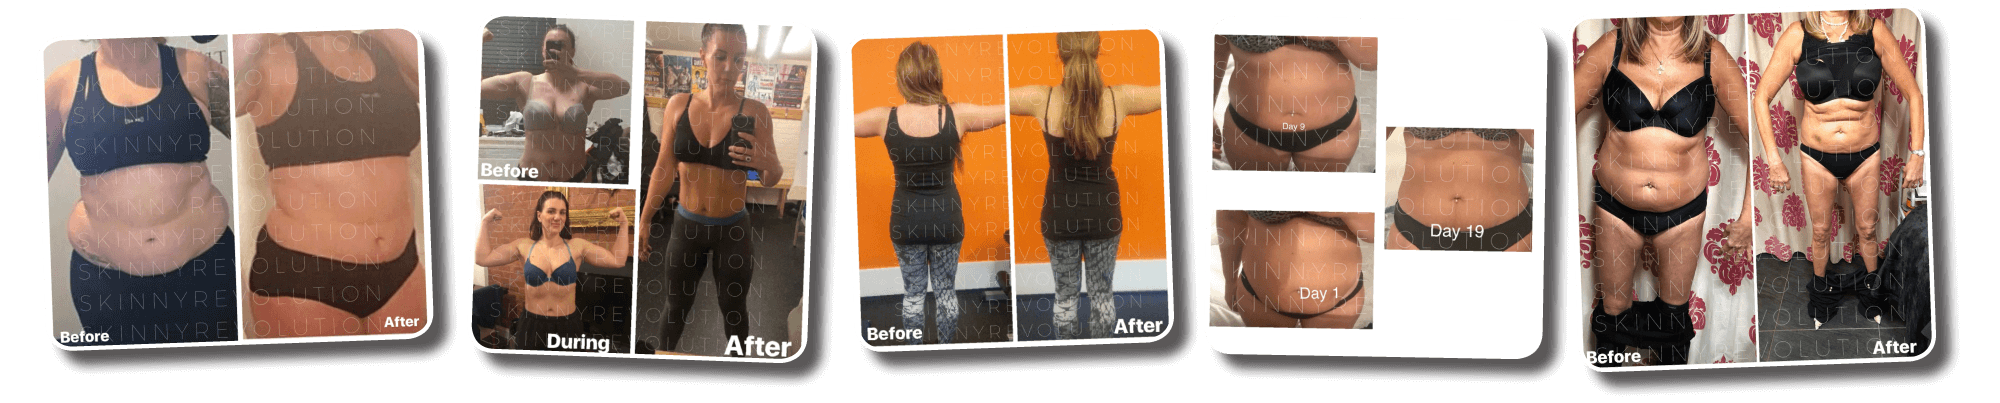 Skinny Revolution Weight Loss Testimonials